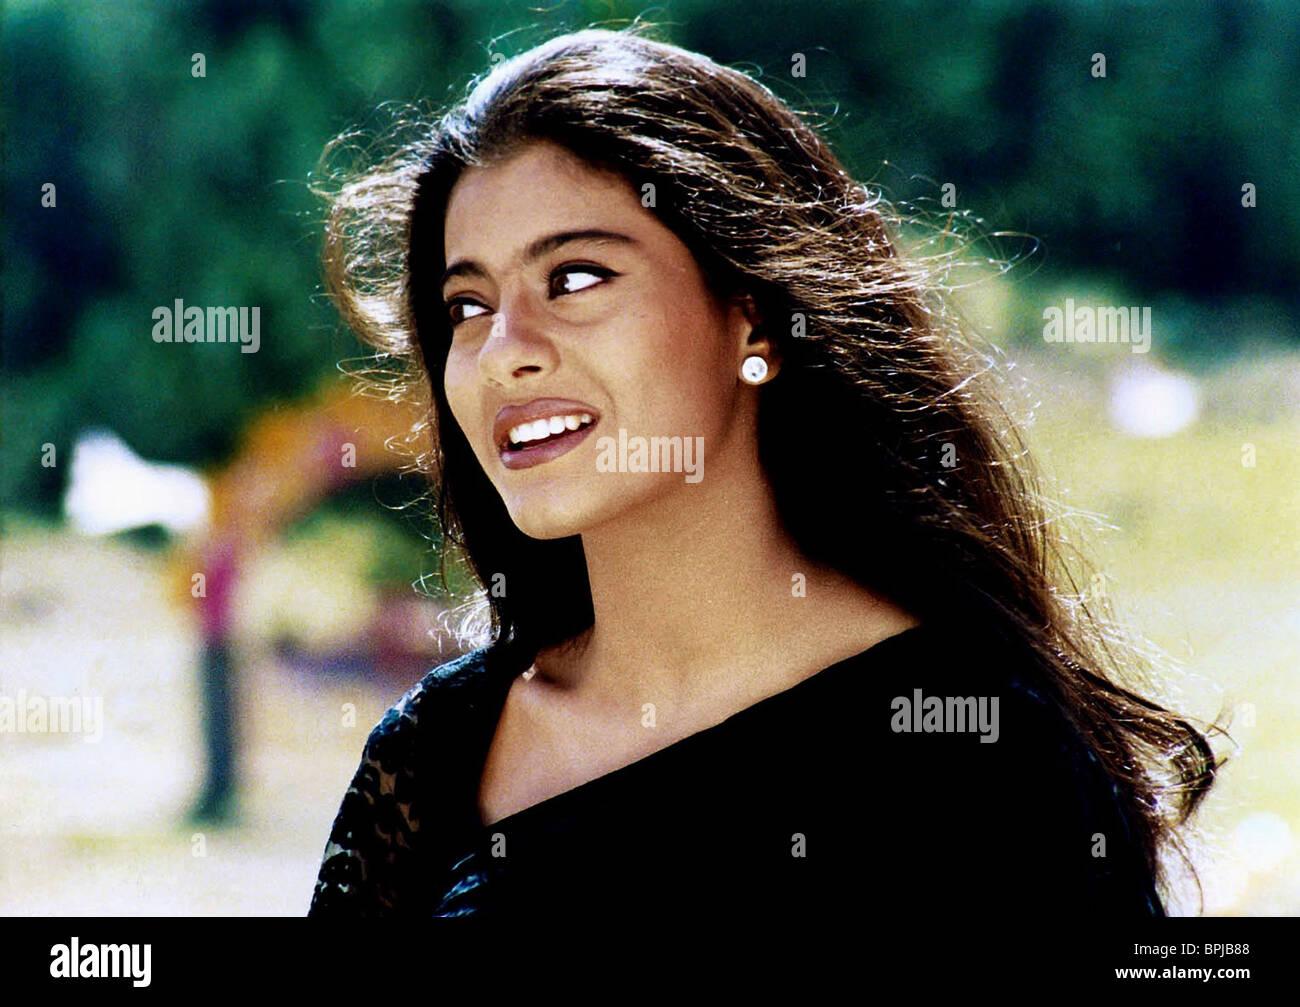 Kajol Als Anjali Sharma Filmtitel Kuch Kuch Hota Hai Stockfotos